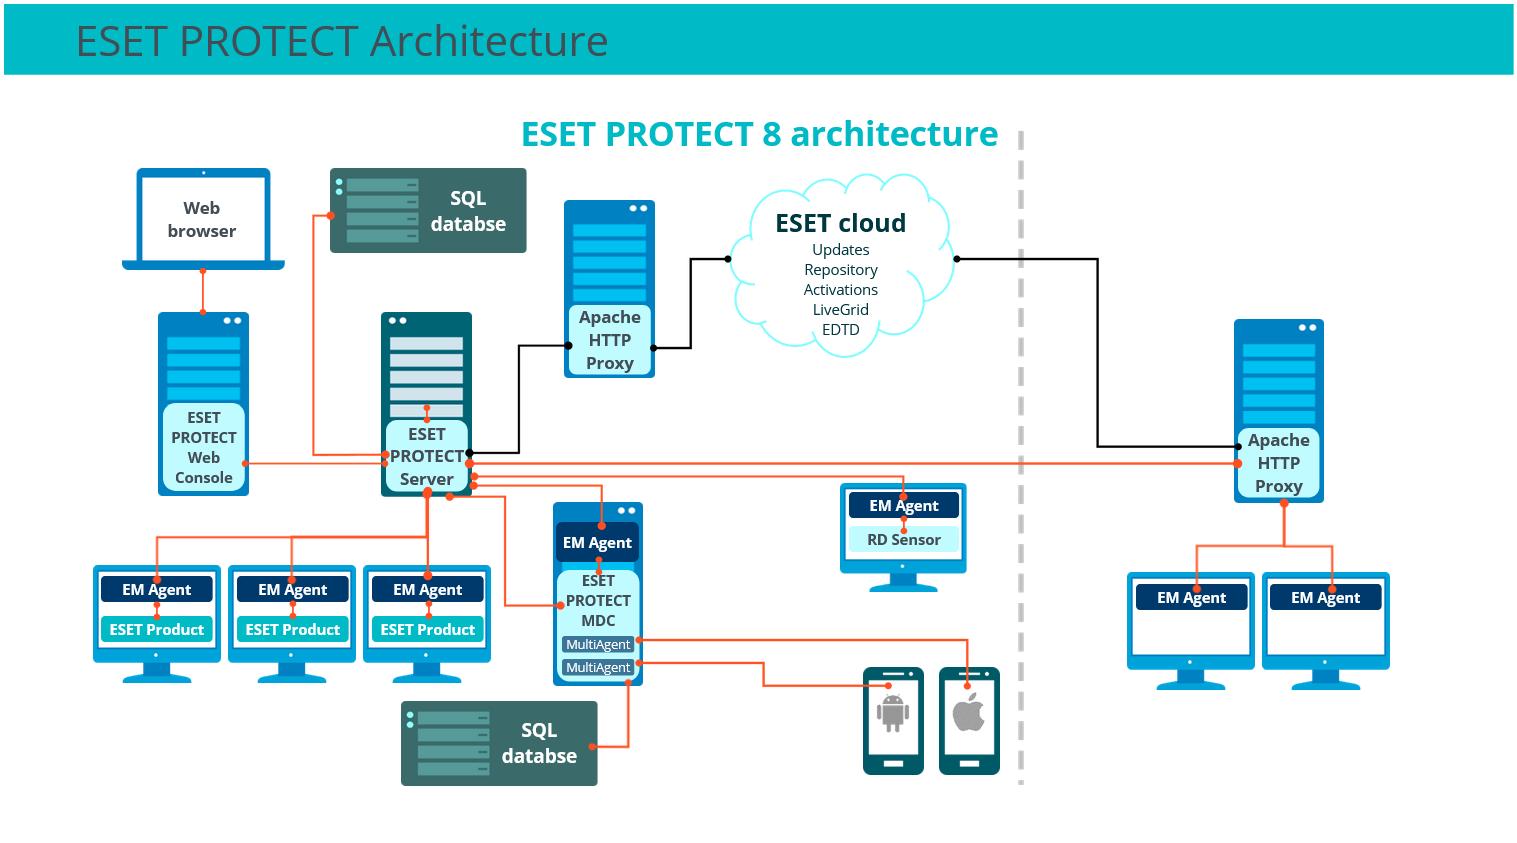 ESET Security Management Center ESMC - ESET Protect EPx - Architecture